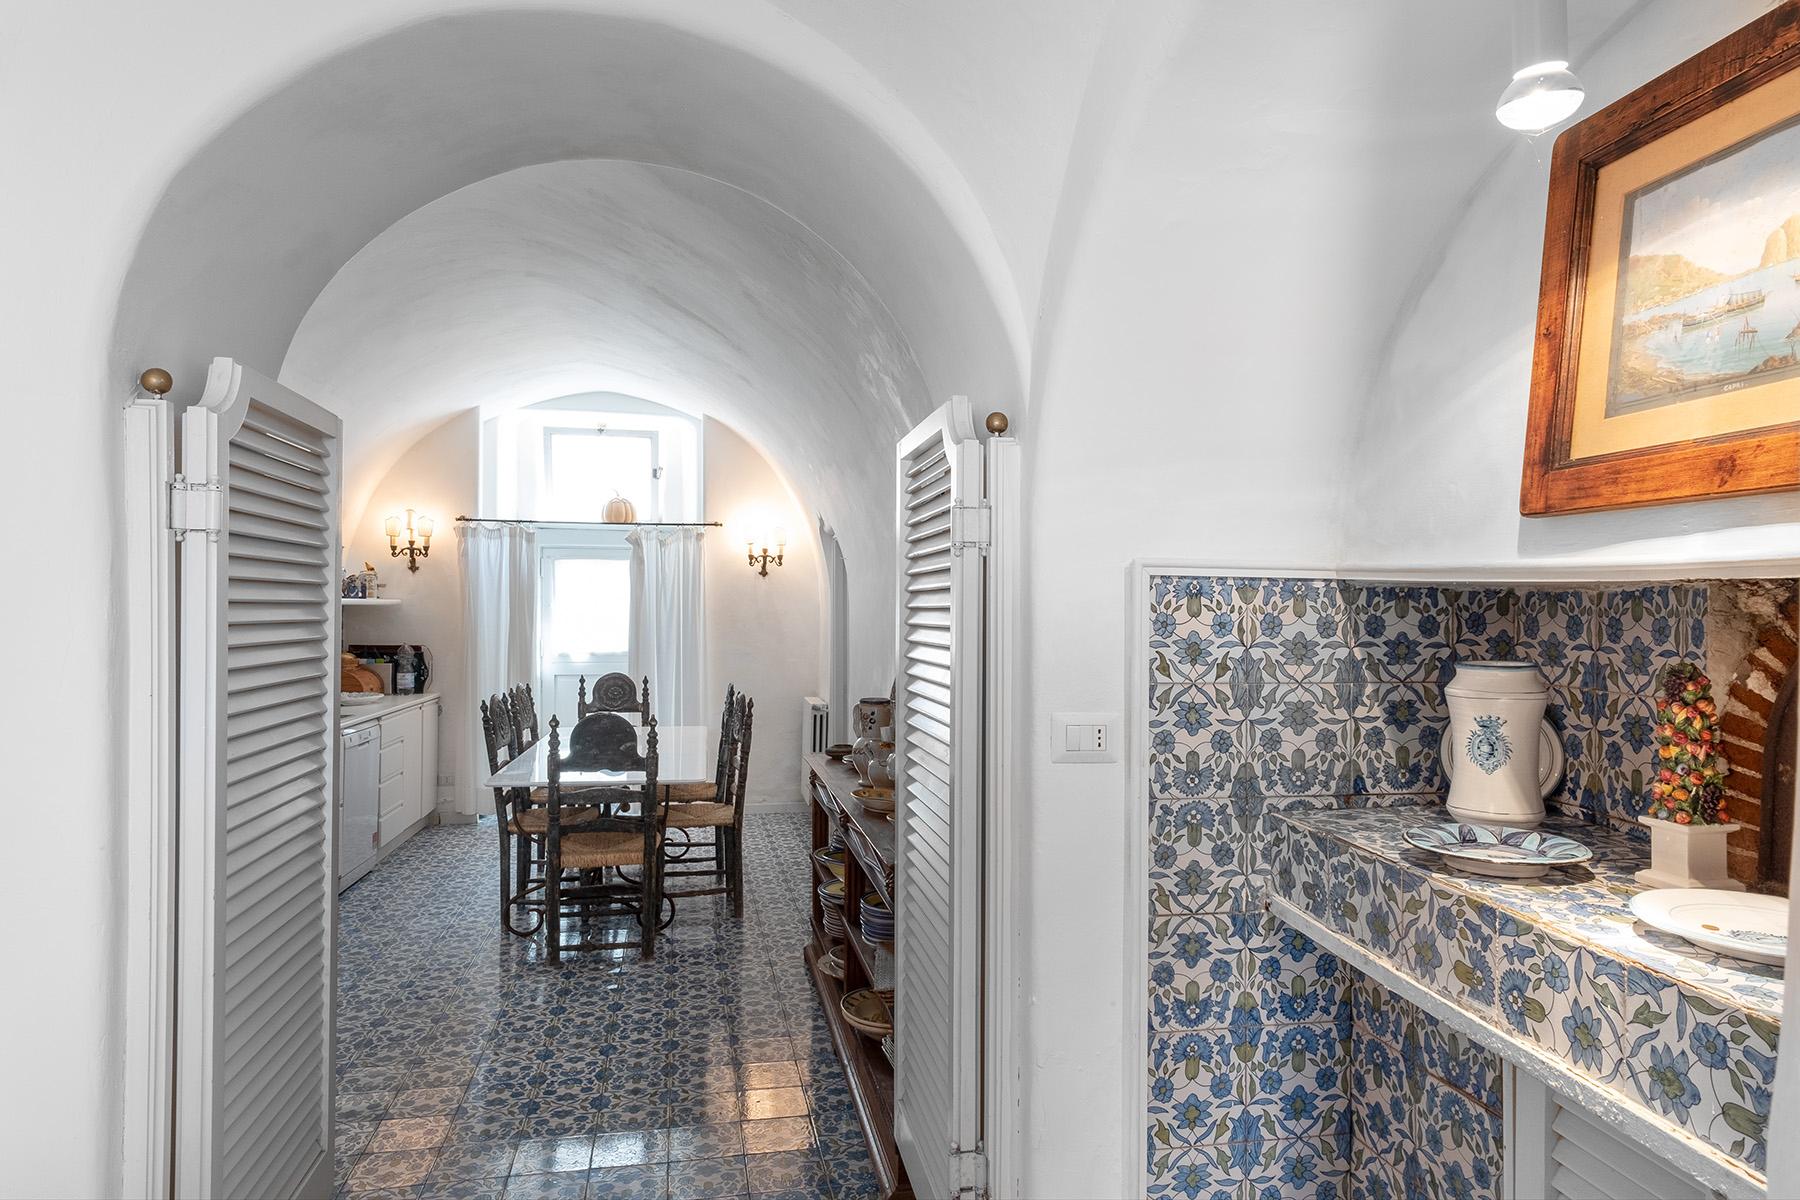 Casa indipendente in Vendita a Capri: 5 locali, 300 mq - Foto 20